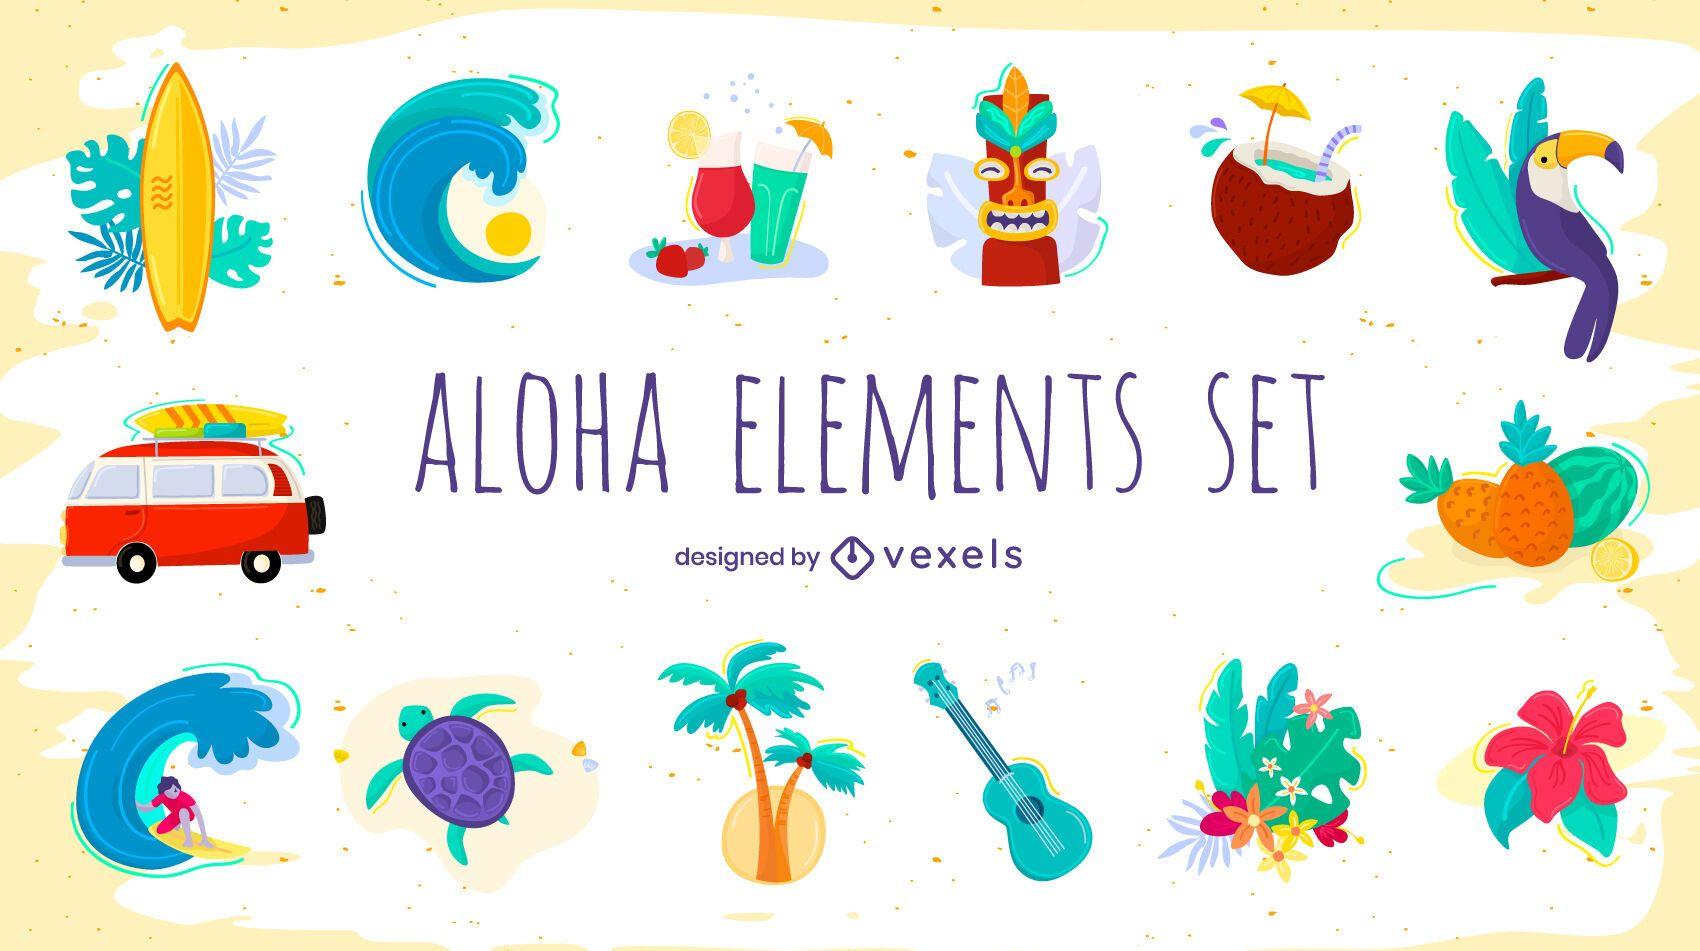 Aloha elements set